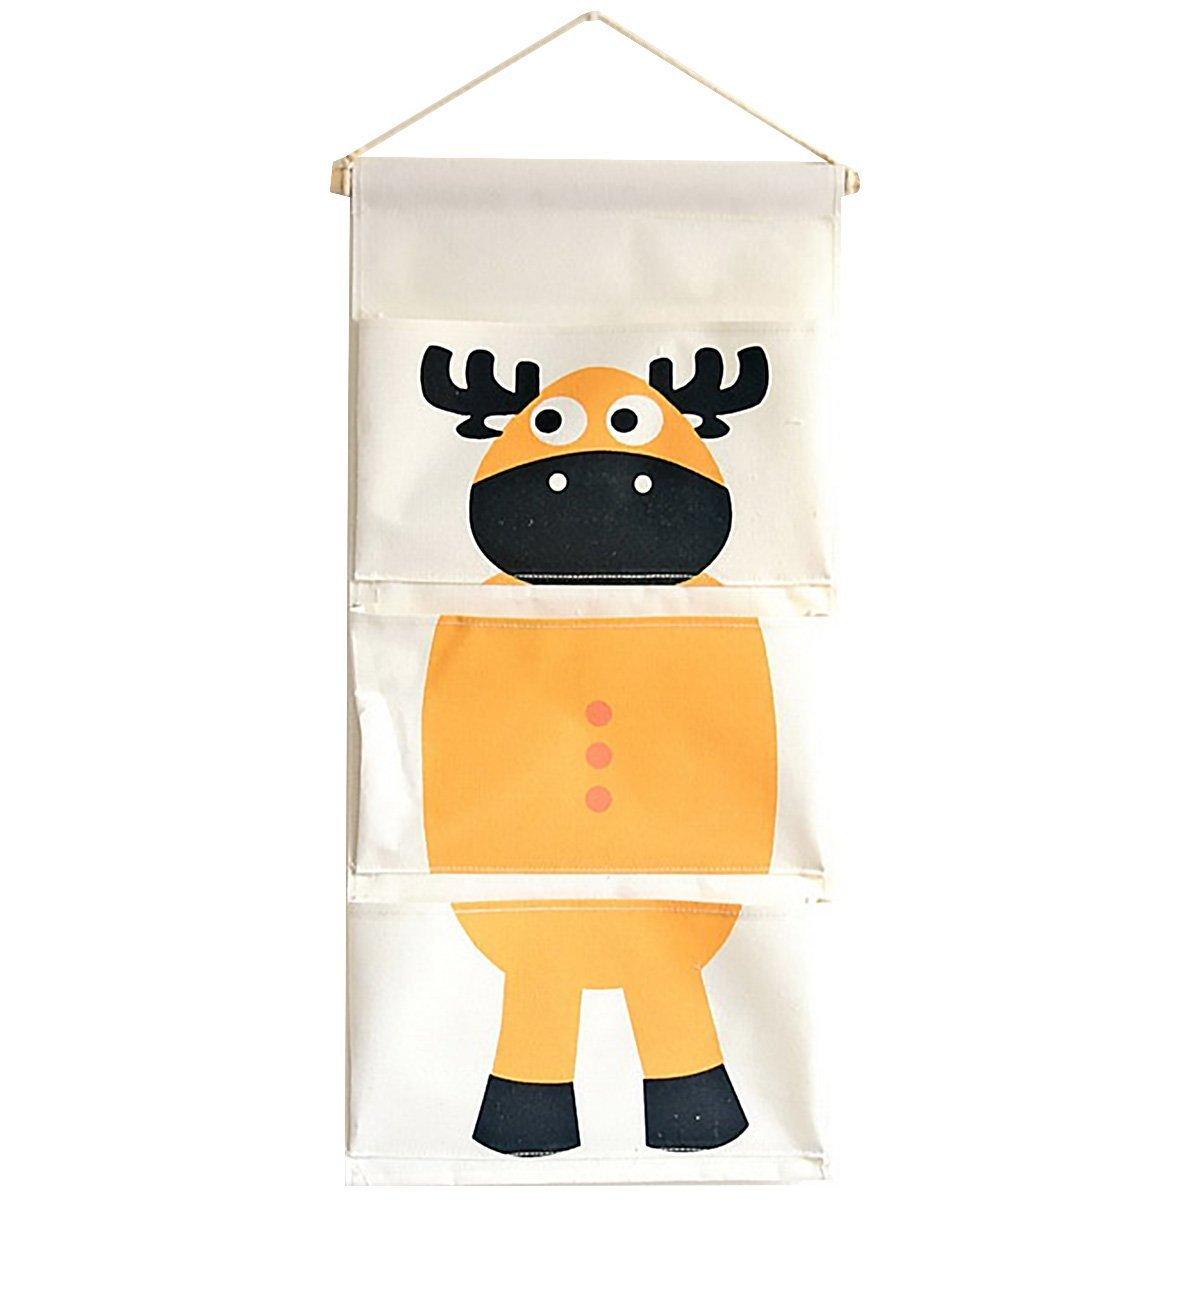 IEVE Cotton Fabric Storage Bag Wall Door Closet Hanging Storage Bag,Hanging Organiser With Pockets,Storage Bag for Children's Bedroom / Door,Pockets Home Organizer (giraffe)